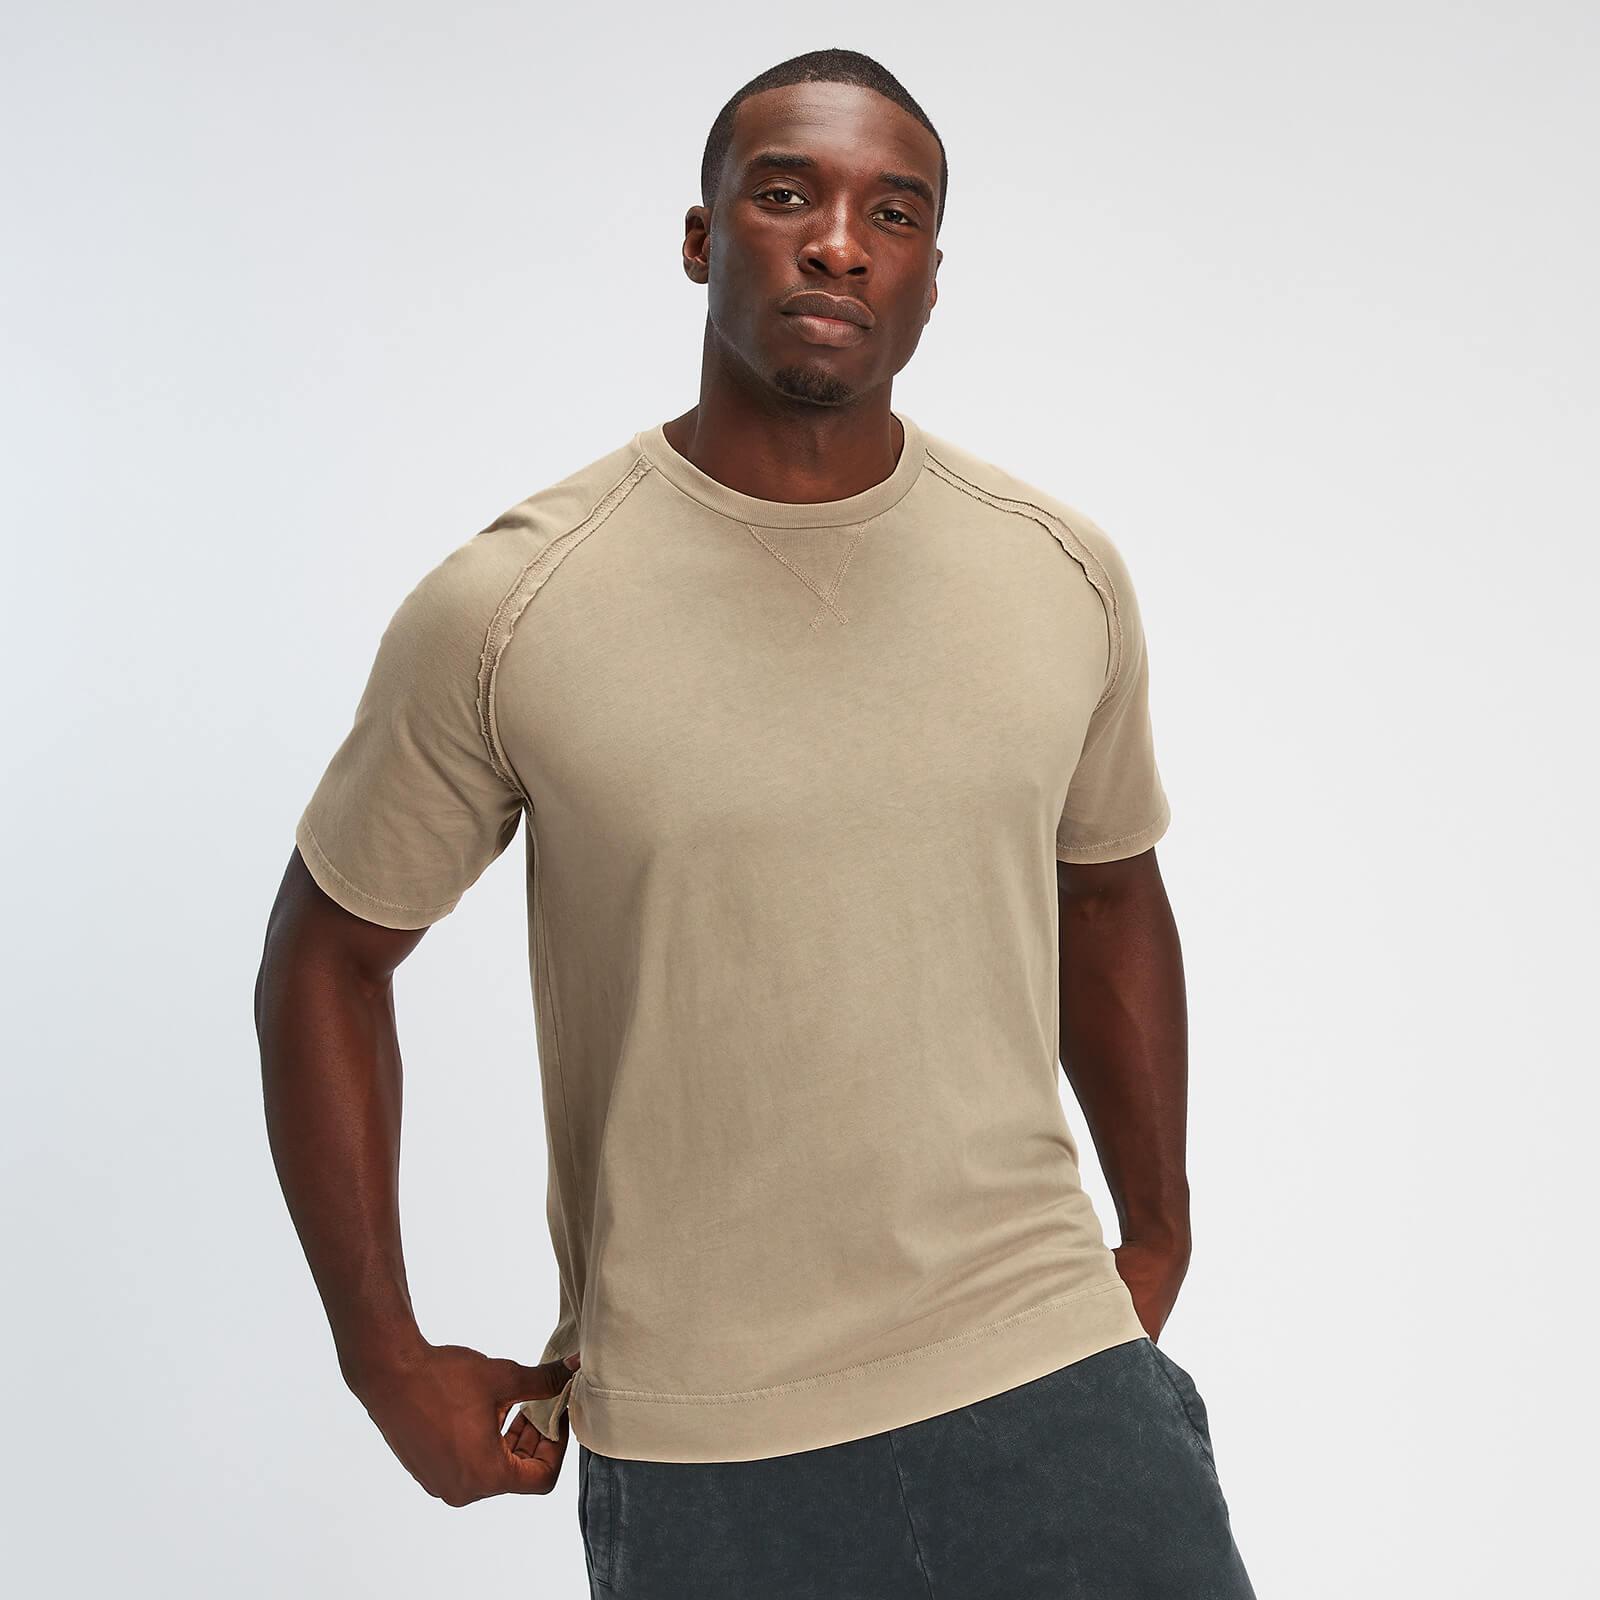 T-shirt MP Raw Training pour hommes – Brun clair - XS